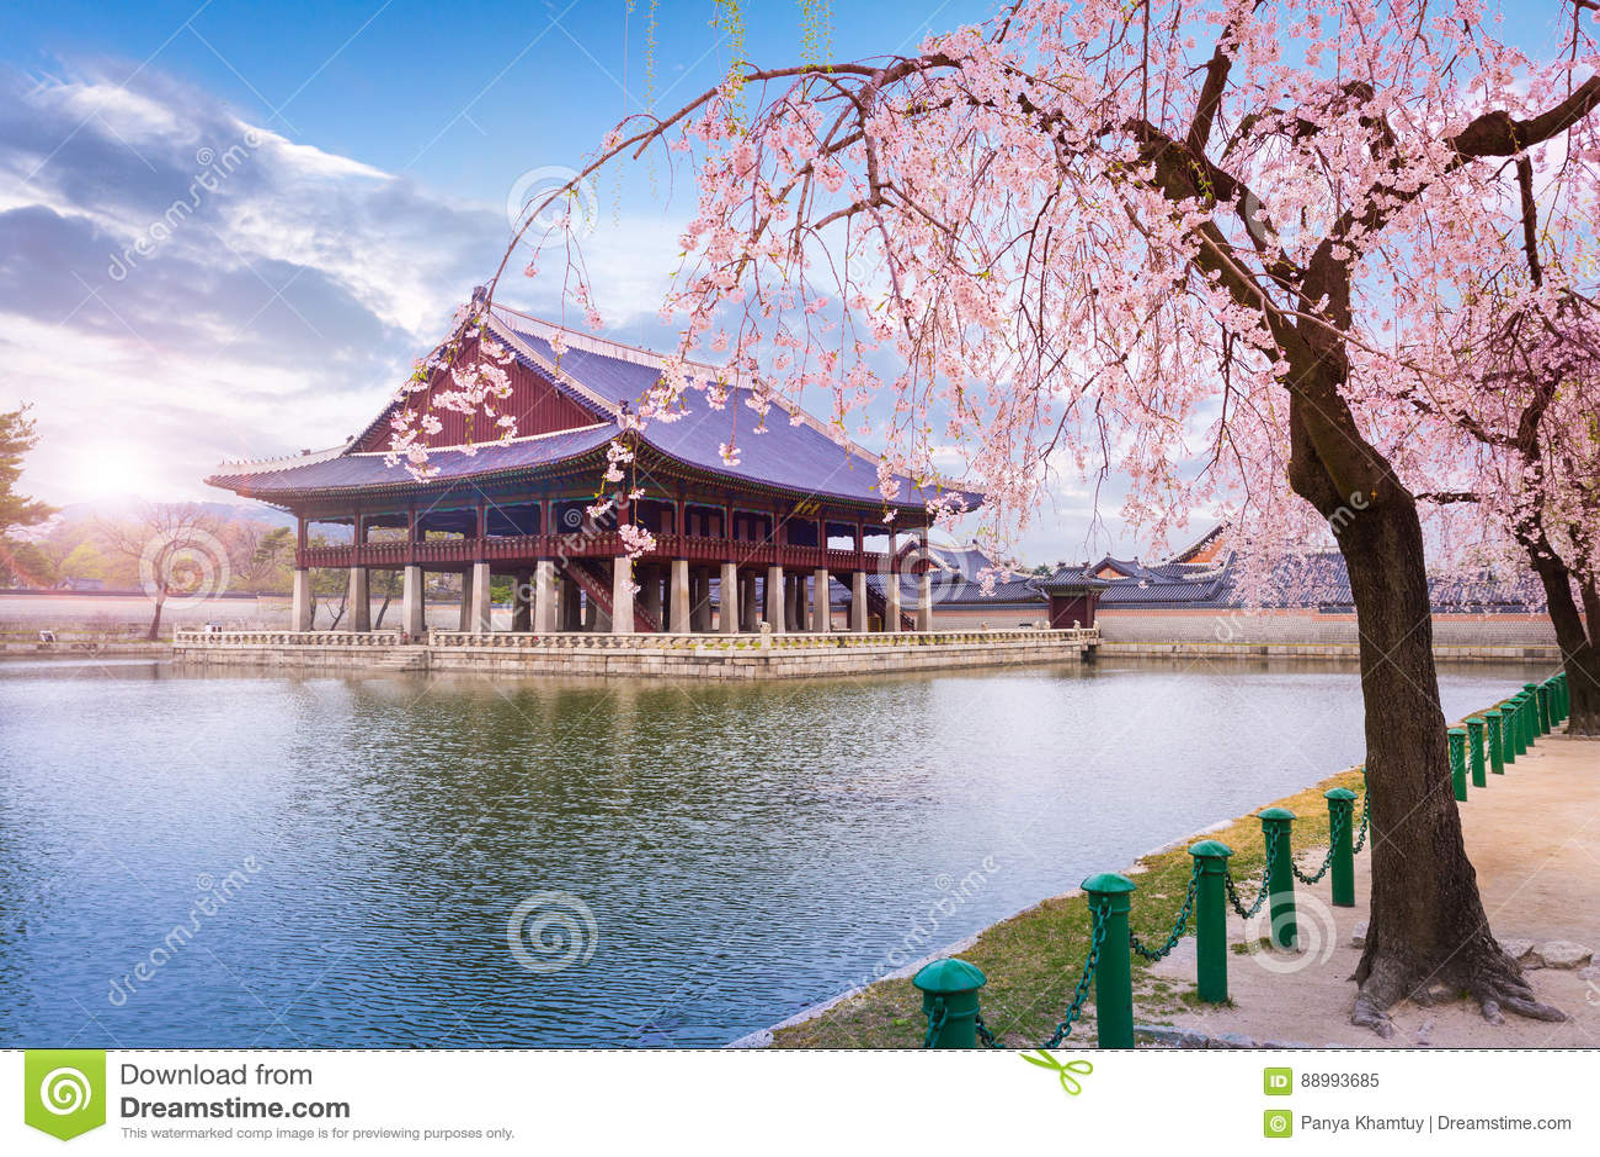 Gyeongbokgung palace in spring South Korea.